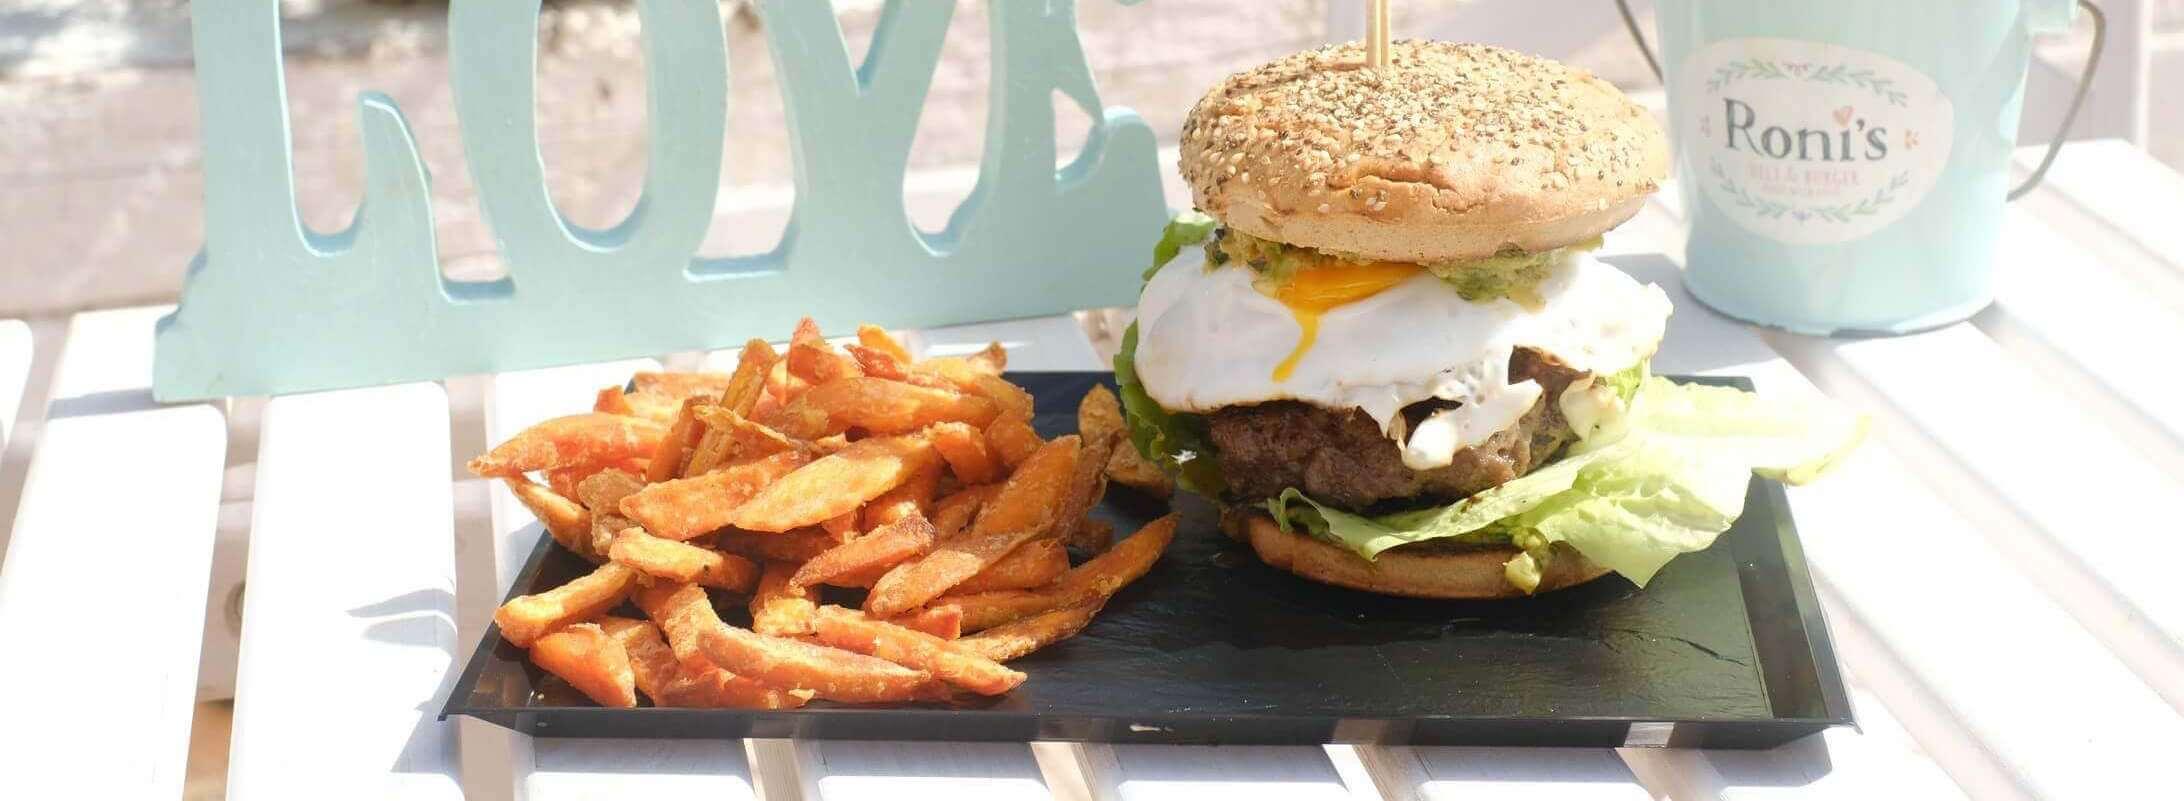 protein-burger-bun-ronis-deli-ibiza